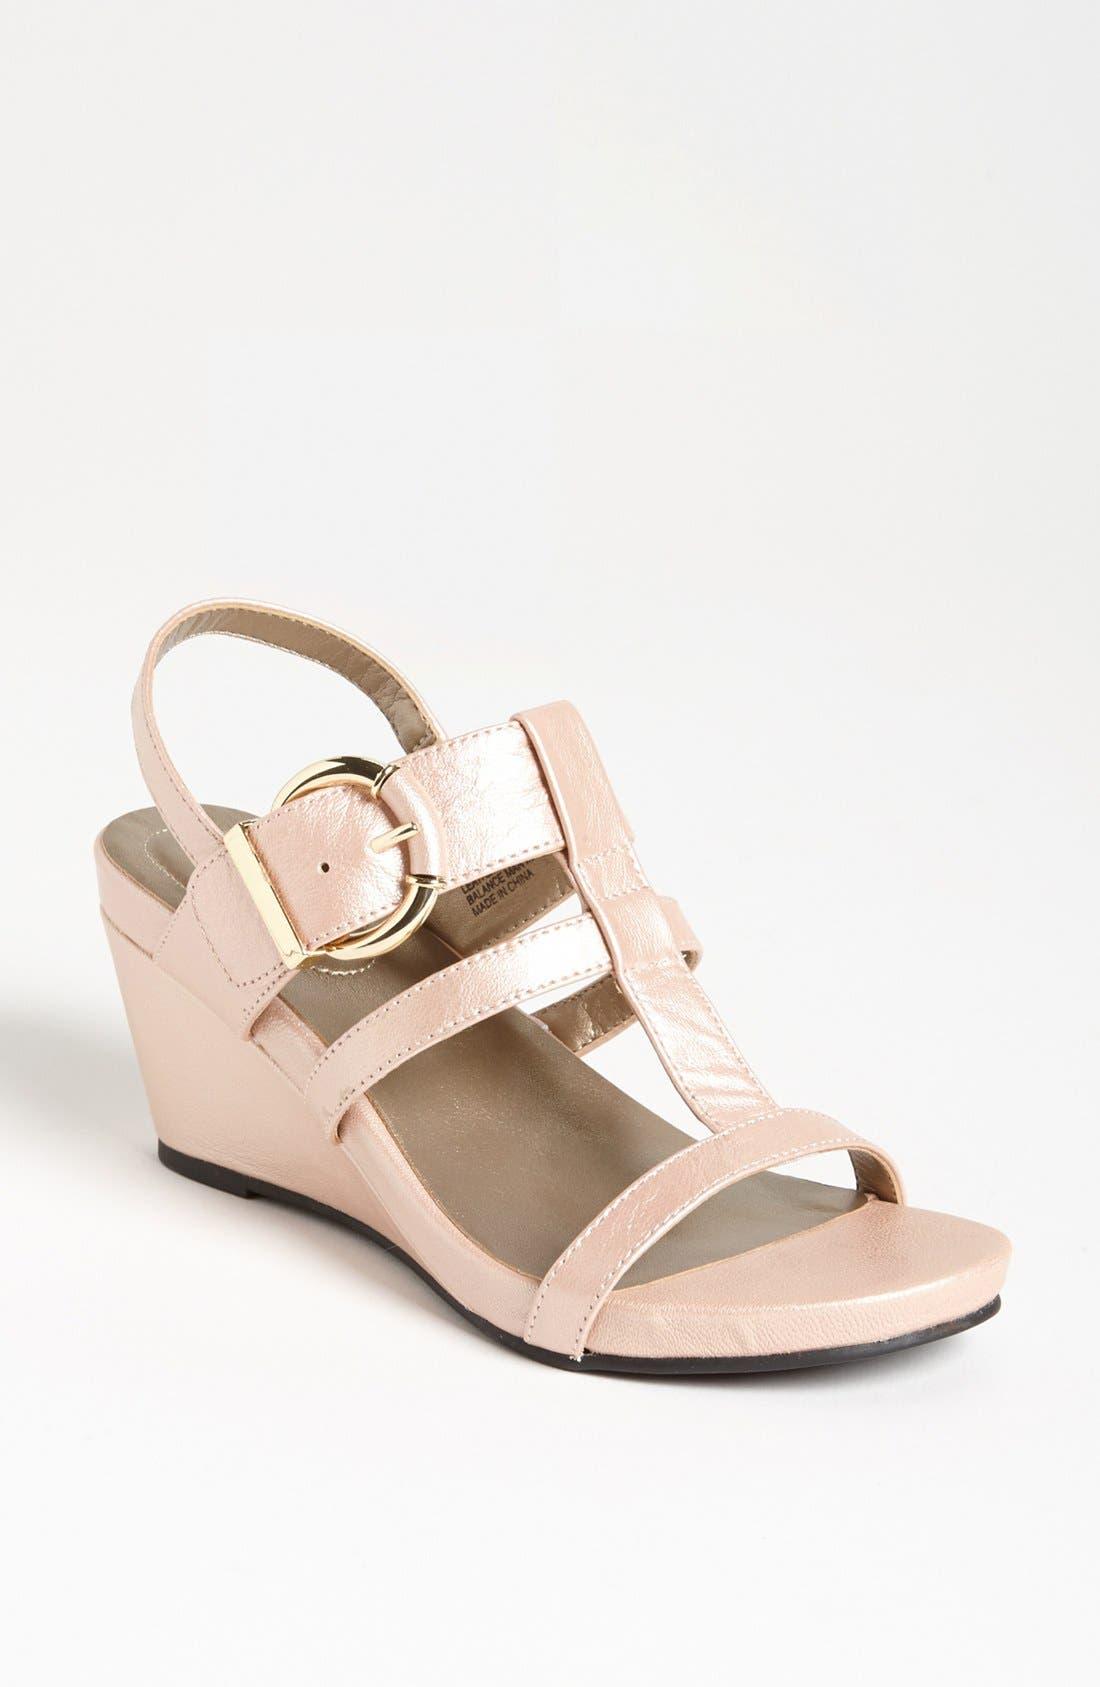 Alternate Image 1 Selected - Me Too 'Helena' Sandal